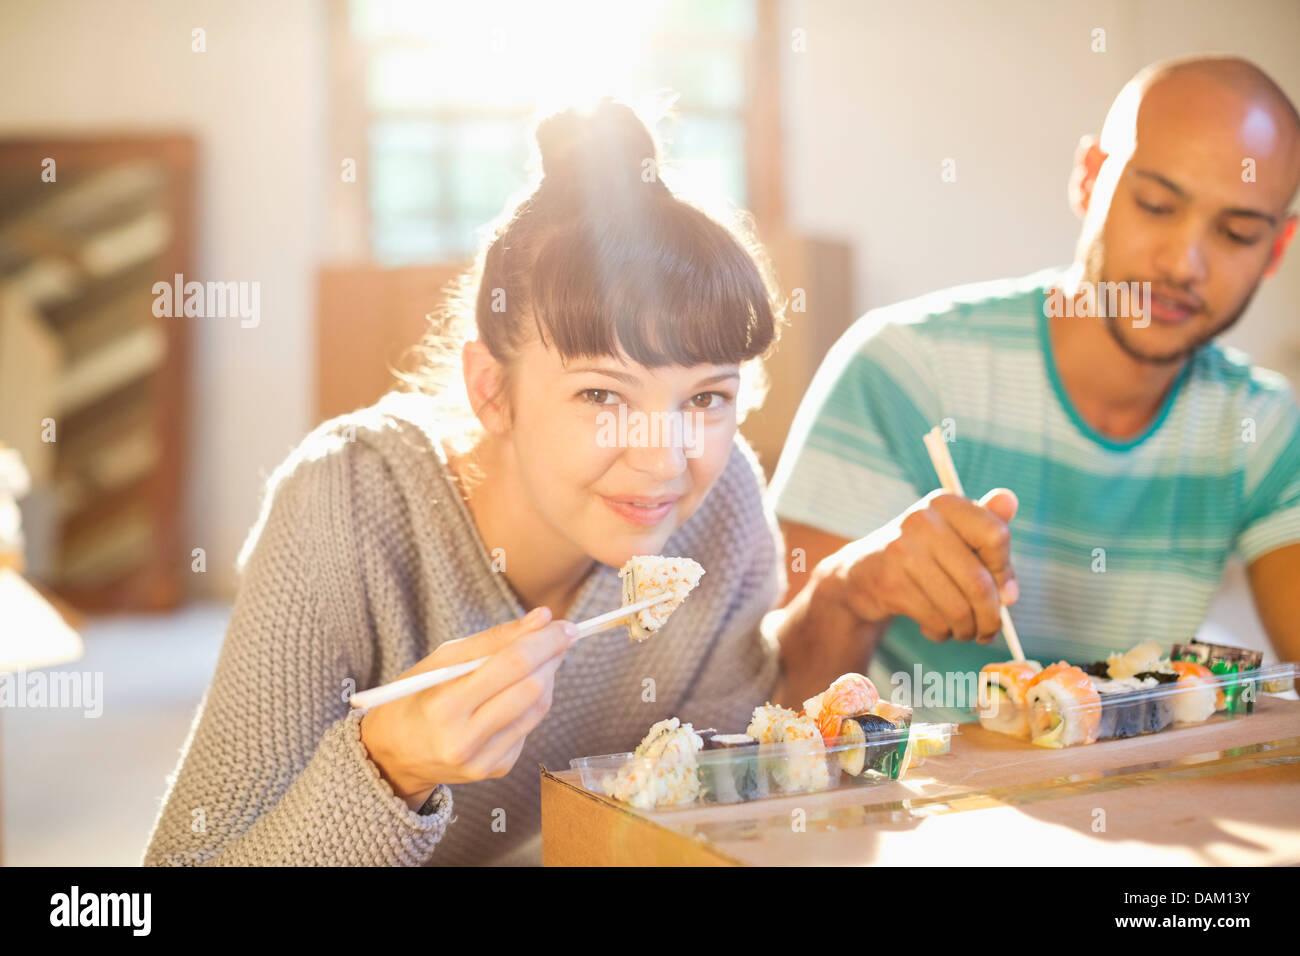 Par de comer sushi juntos Foto de stock